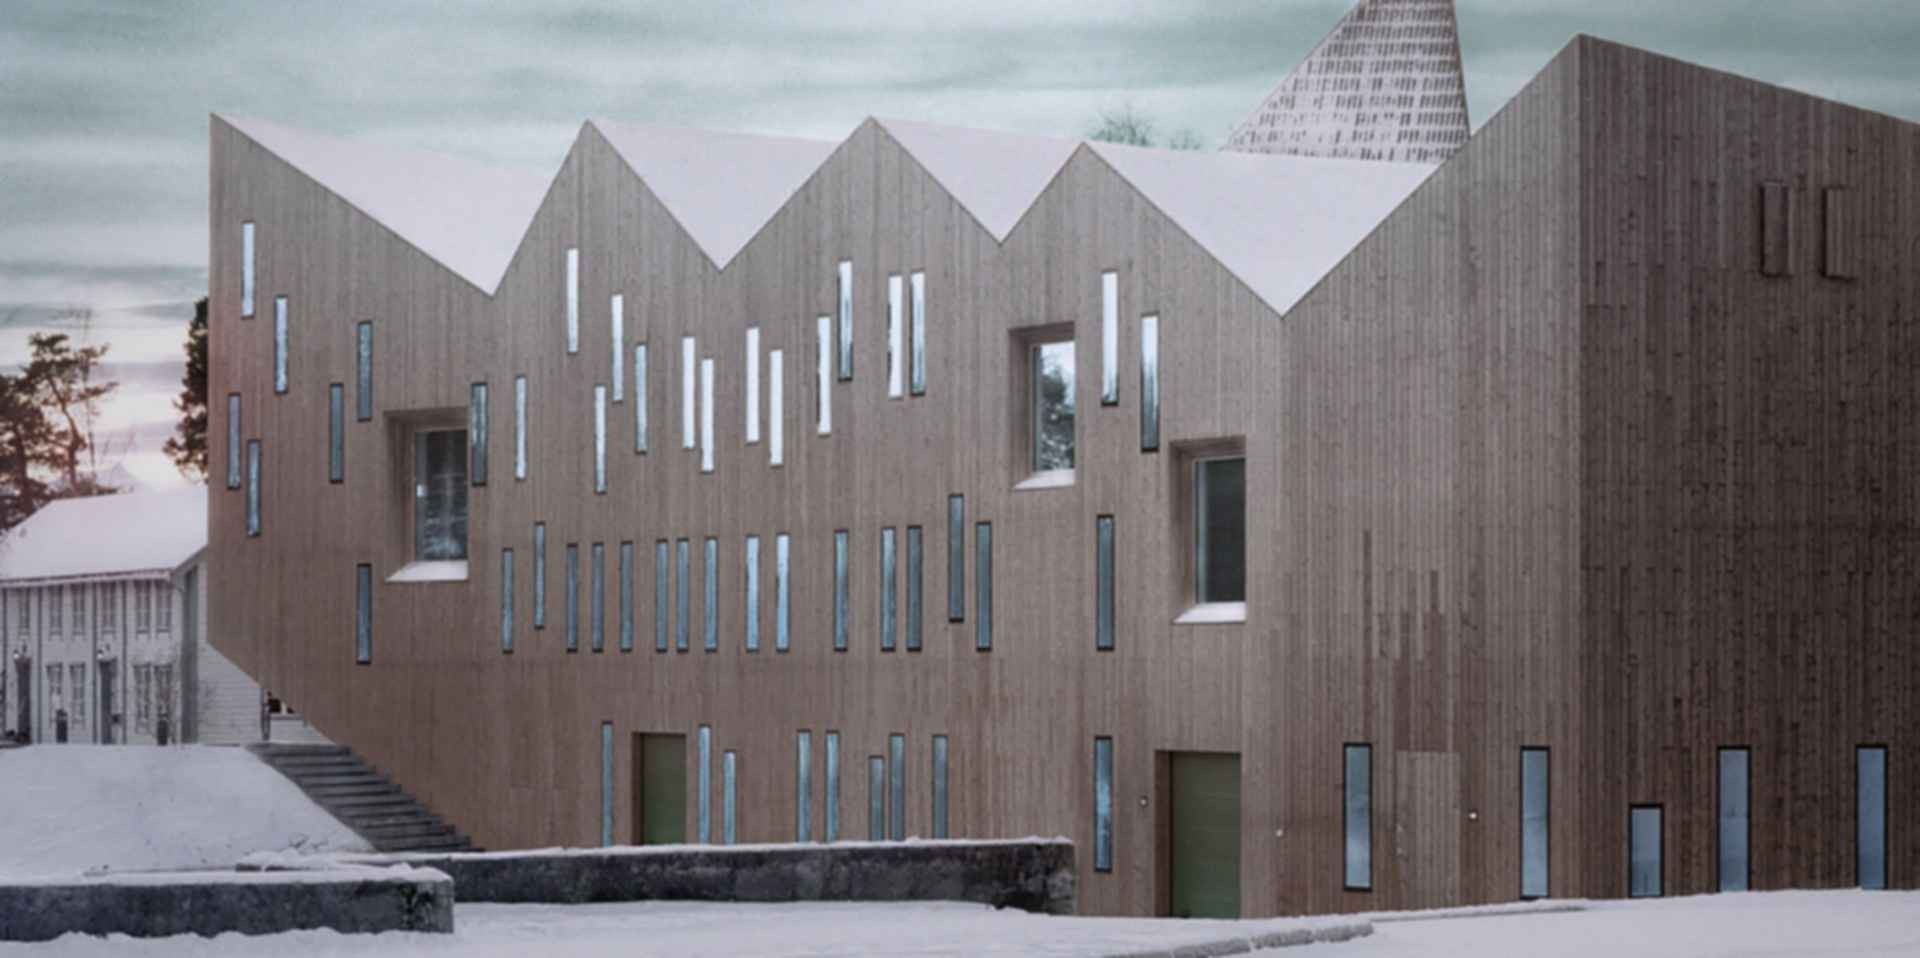 Romsdal Folk Museum - Exterior